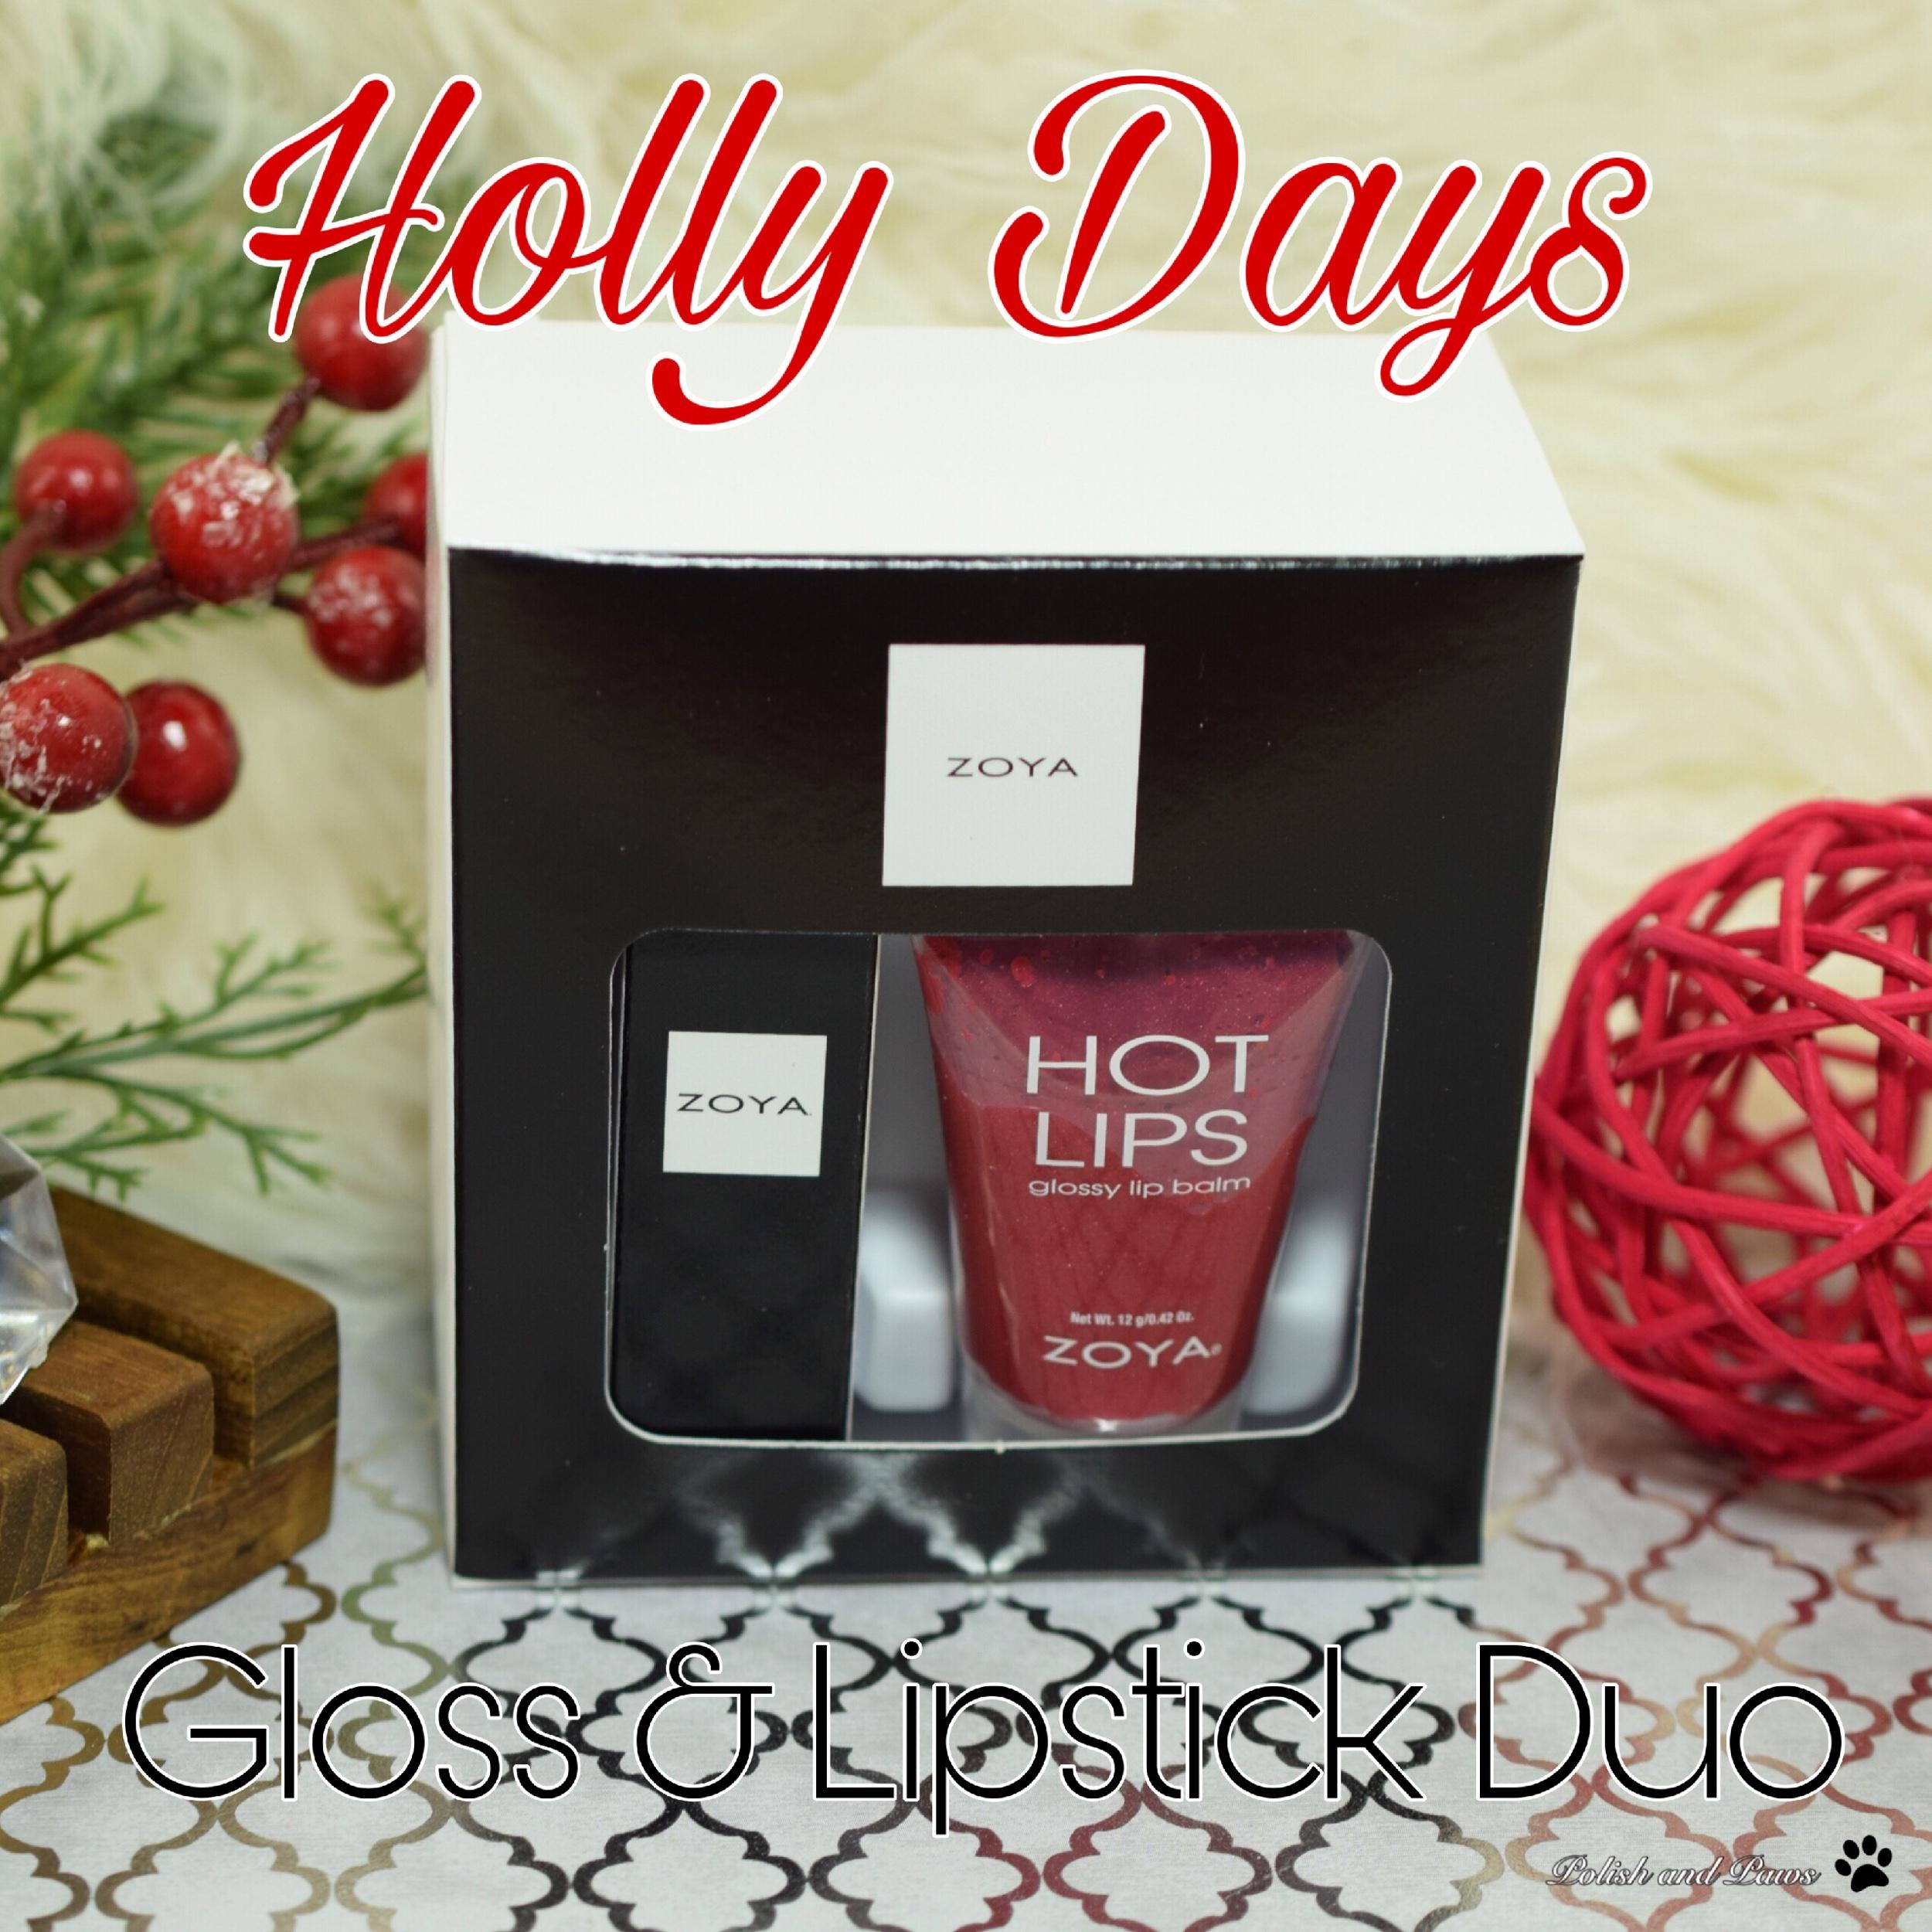 Zoya Holly Days Gloss & Lipstick Duo